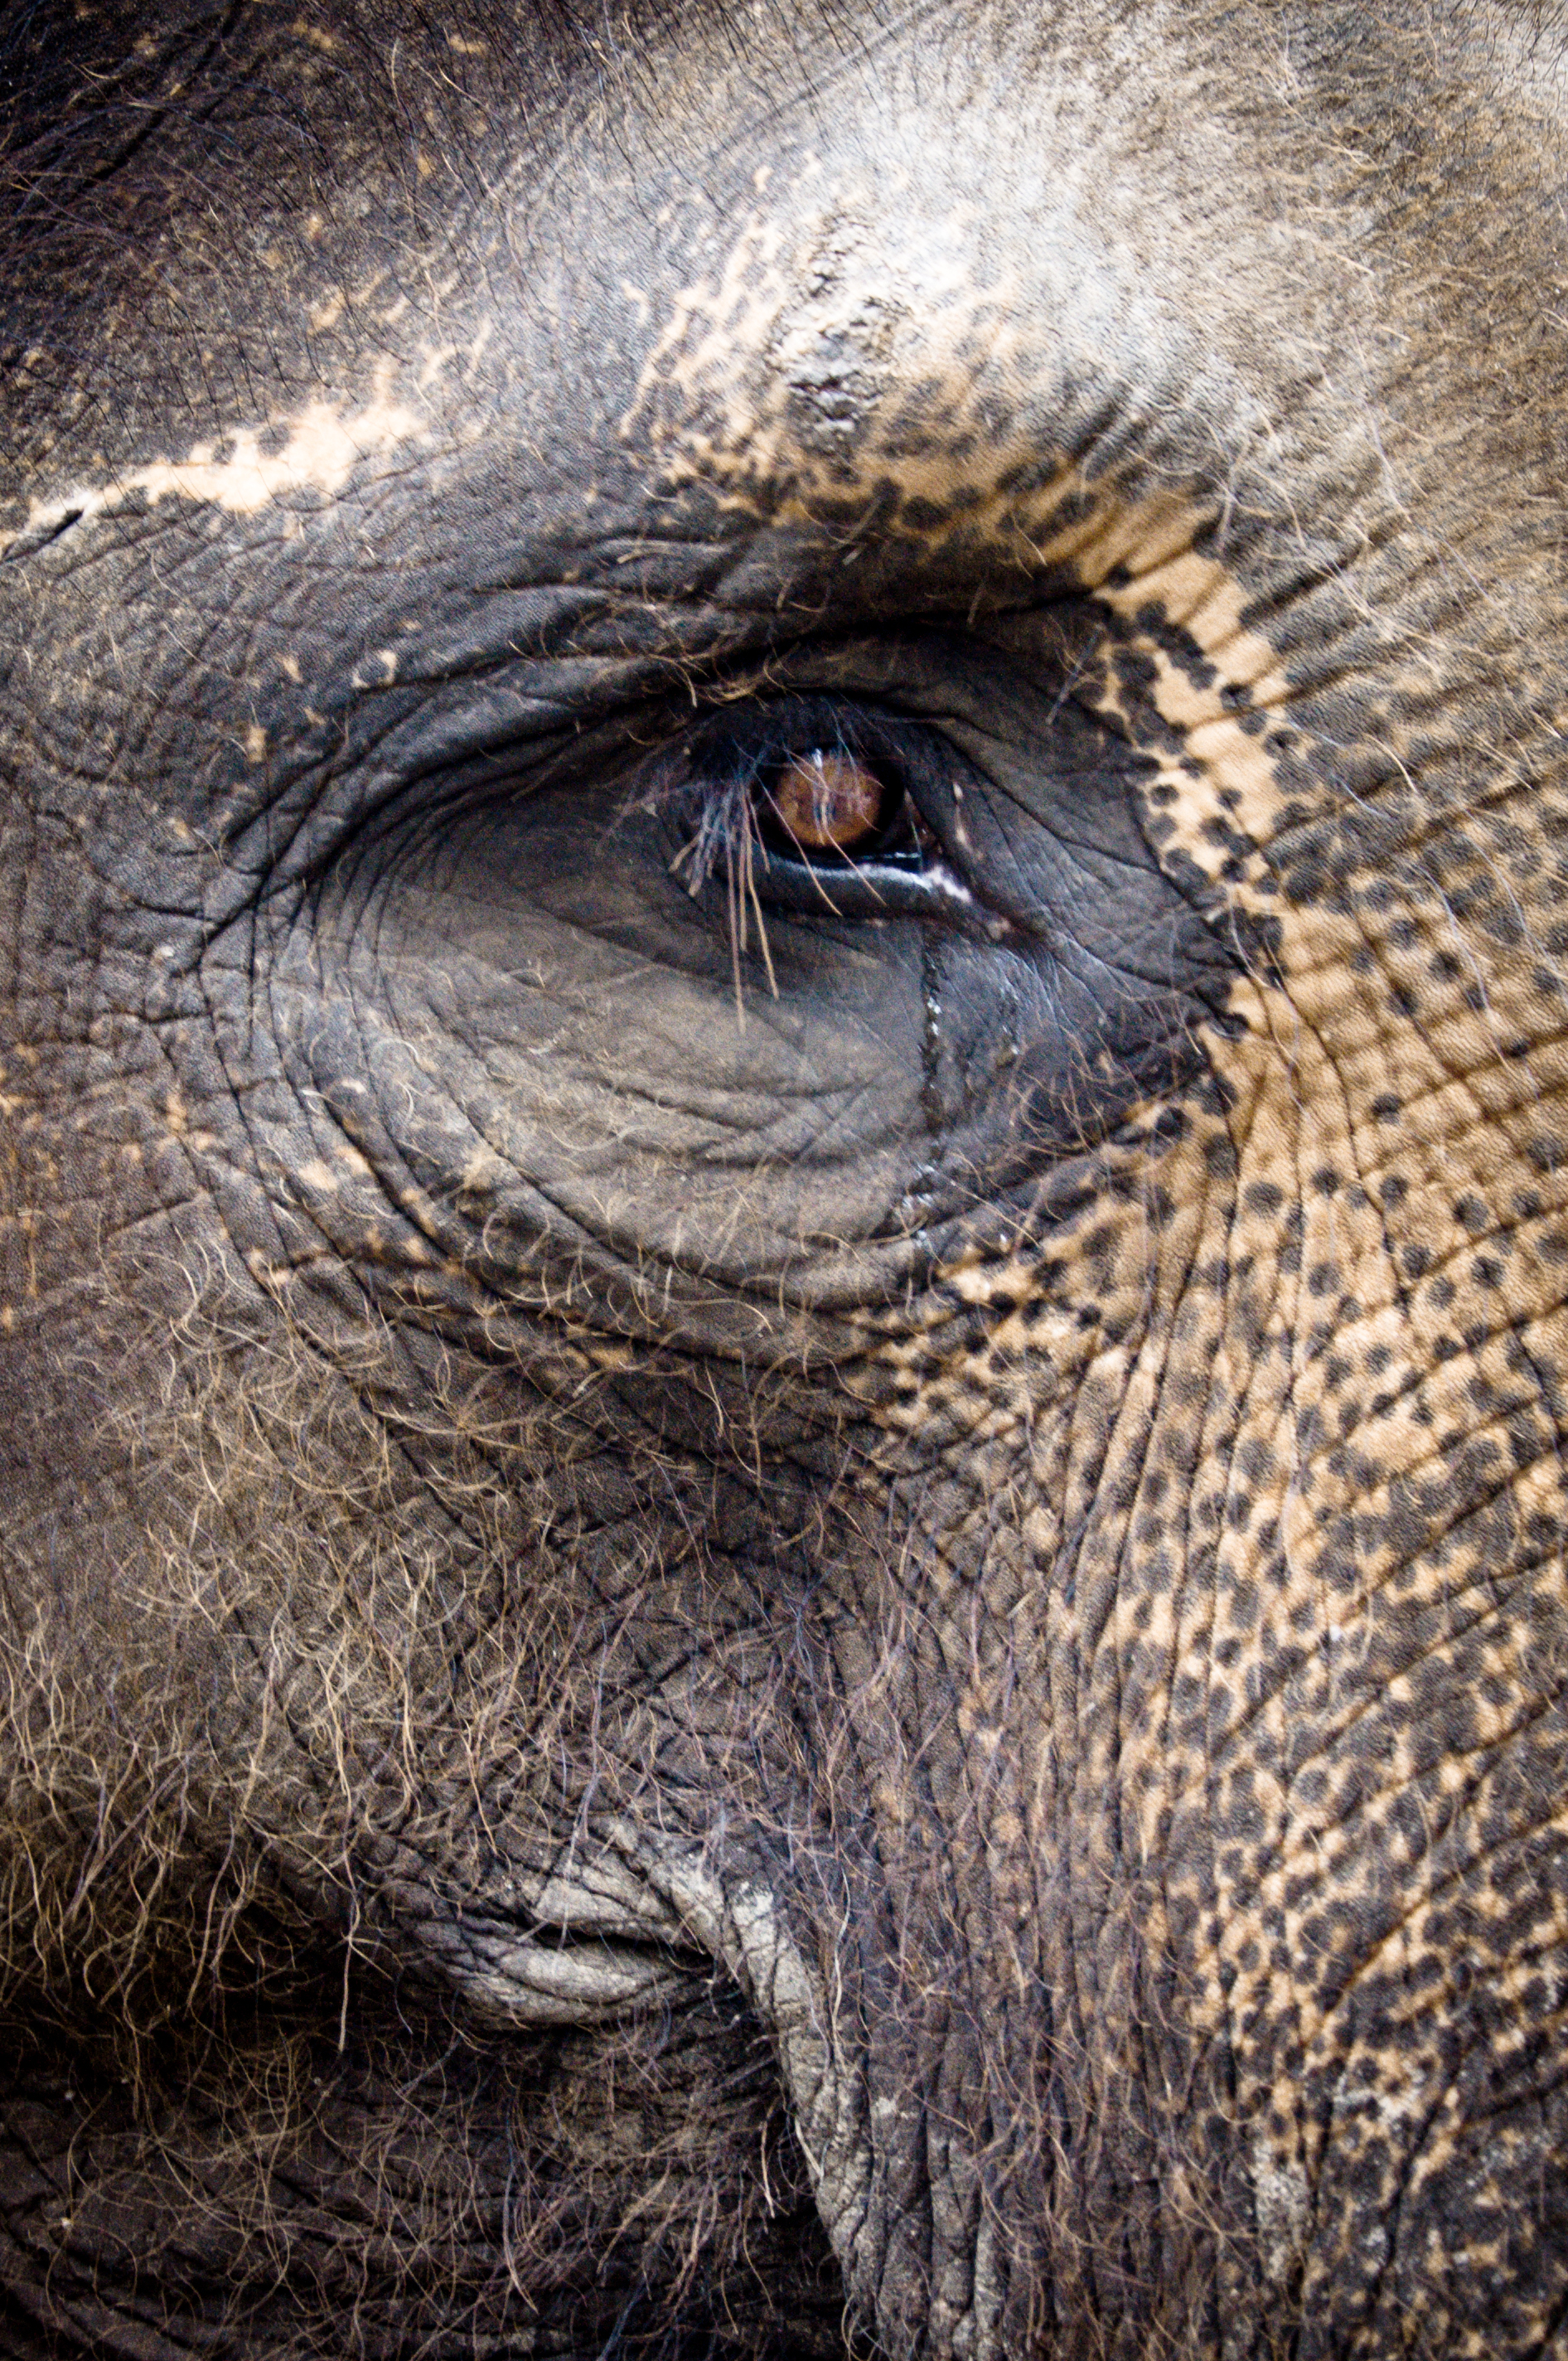 Elephant, Animal, Staring, Skin, Portrait, HQ Photo